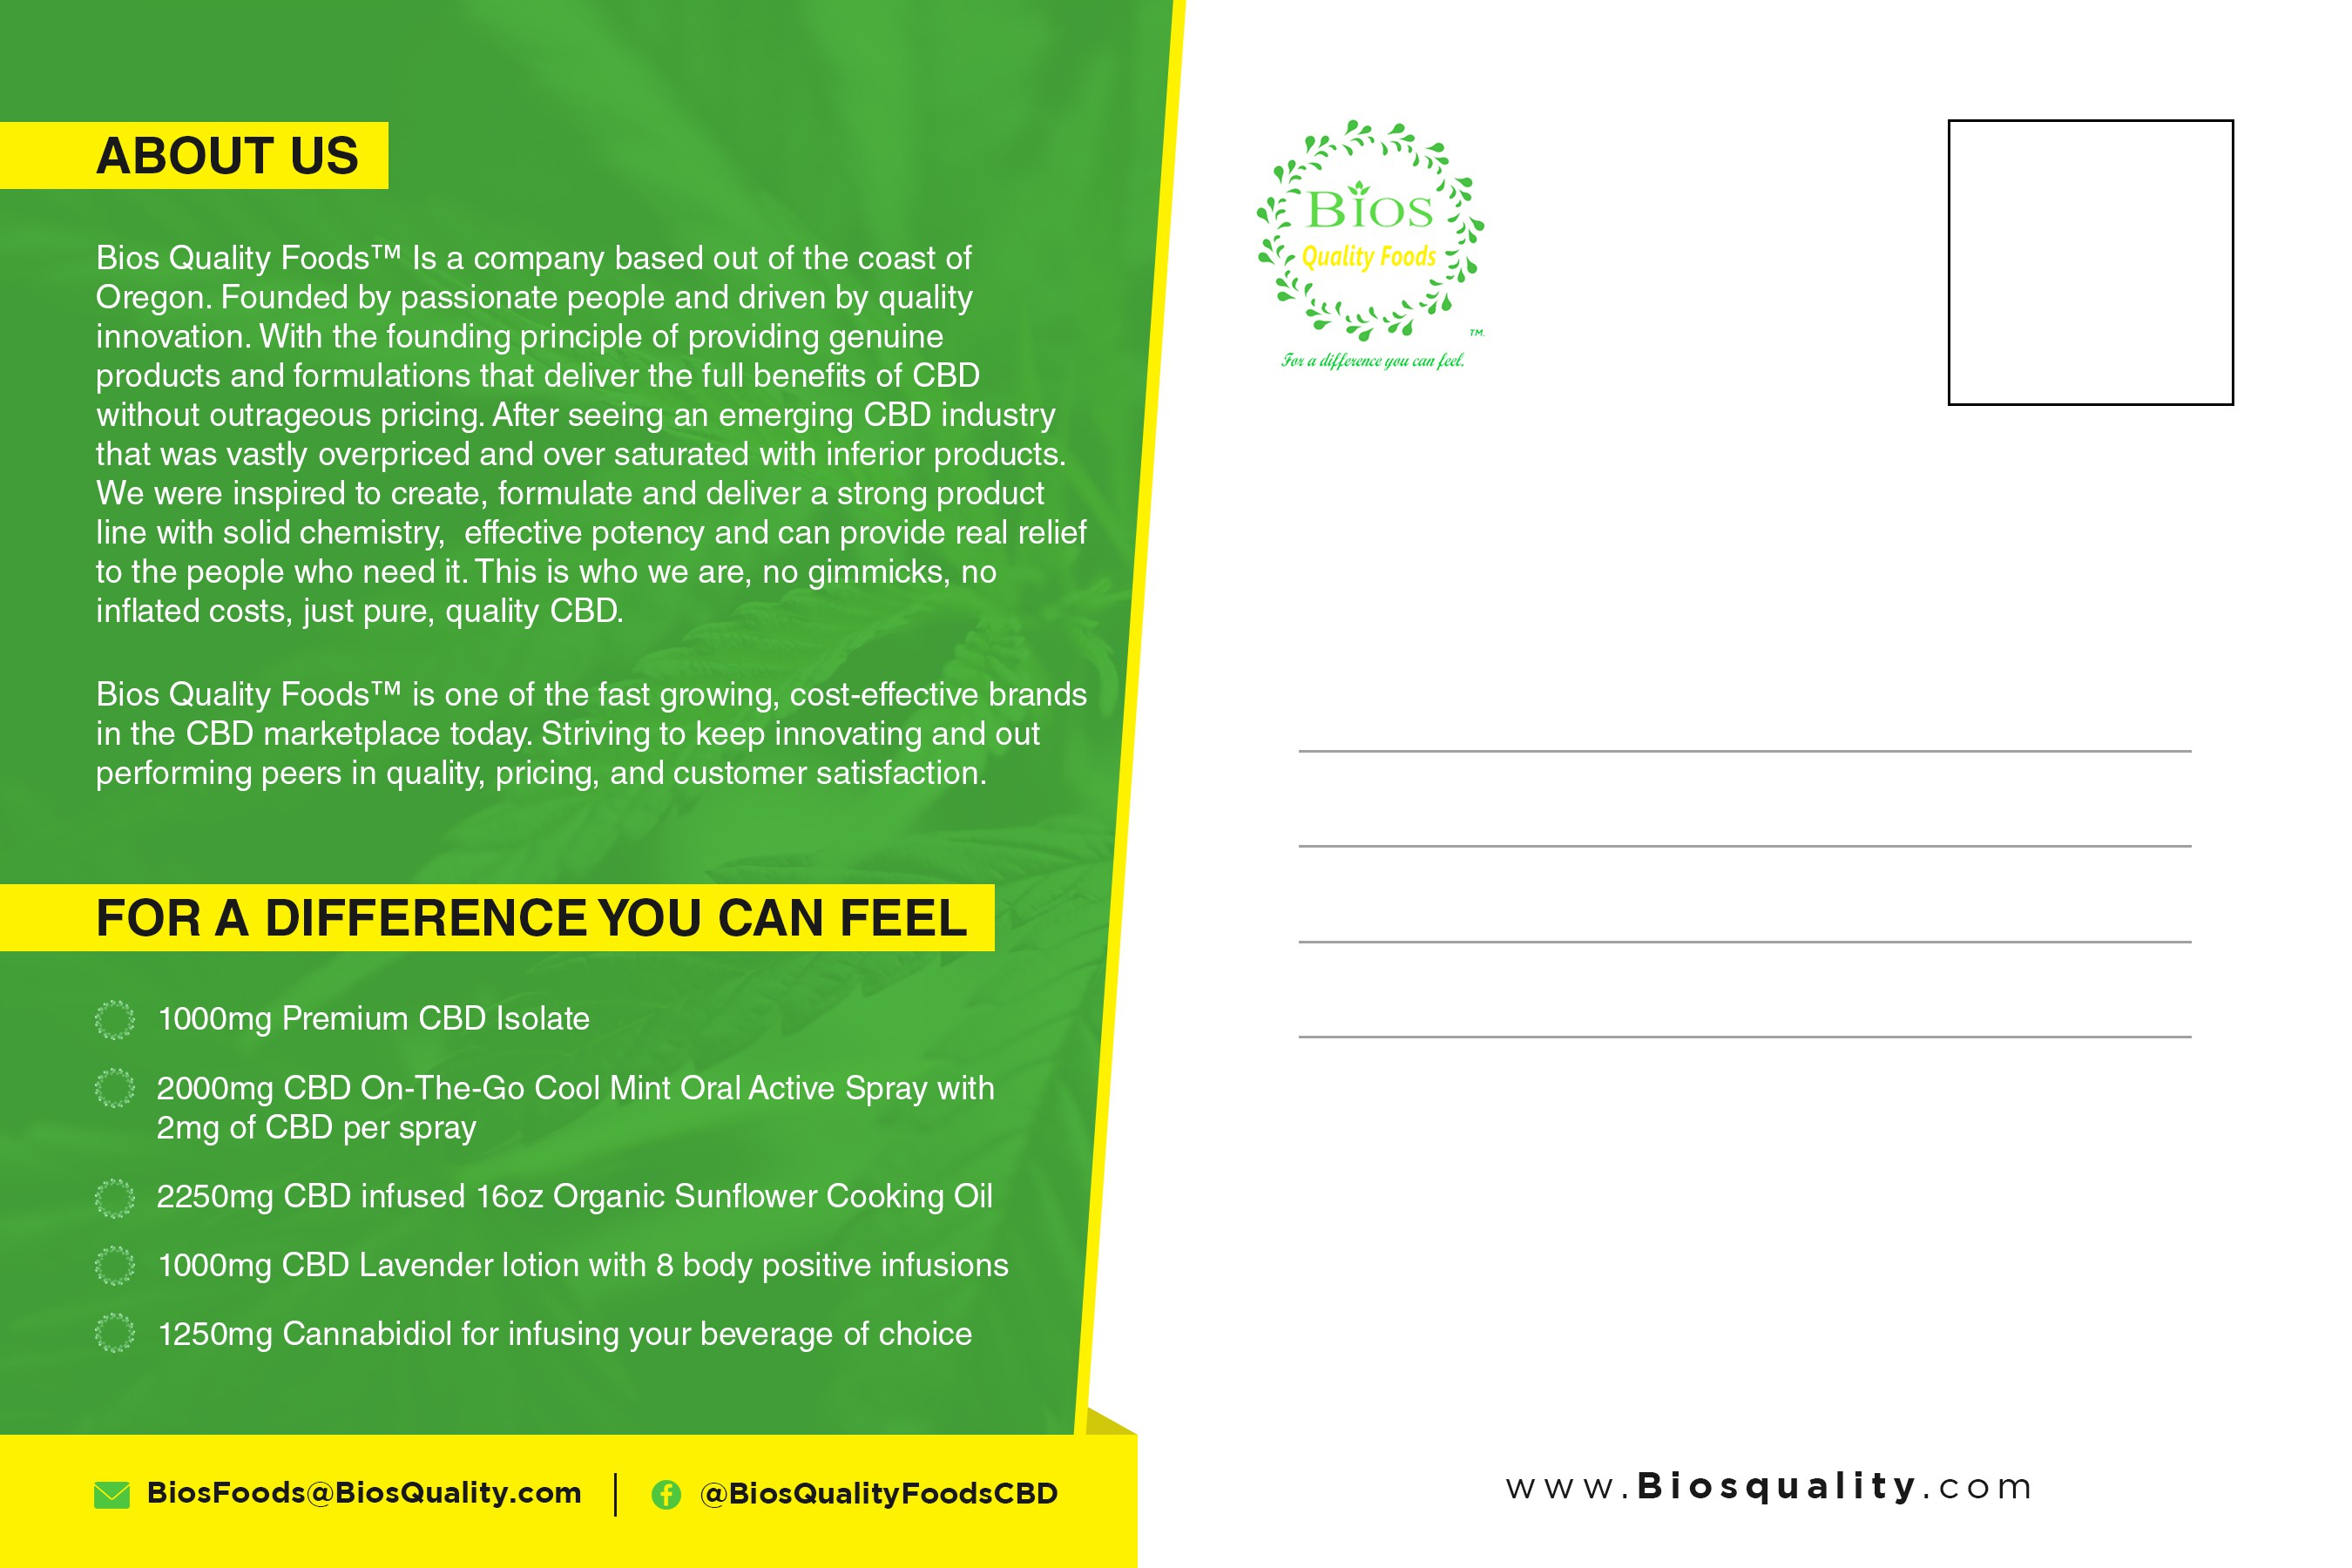 Design a Creative Cannabidiol(CBD) 6x9' Postcard ad